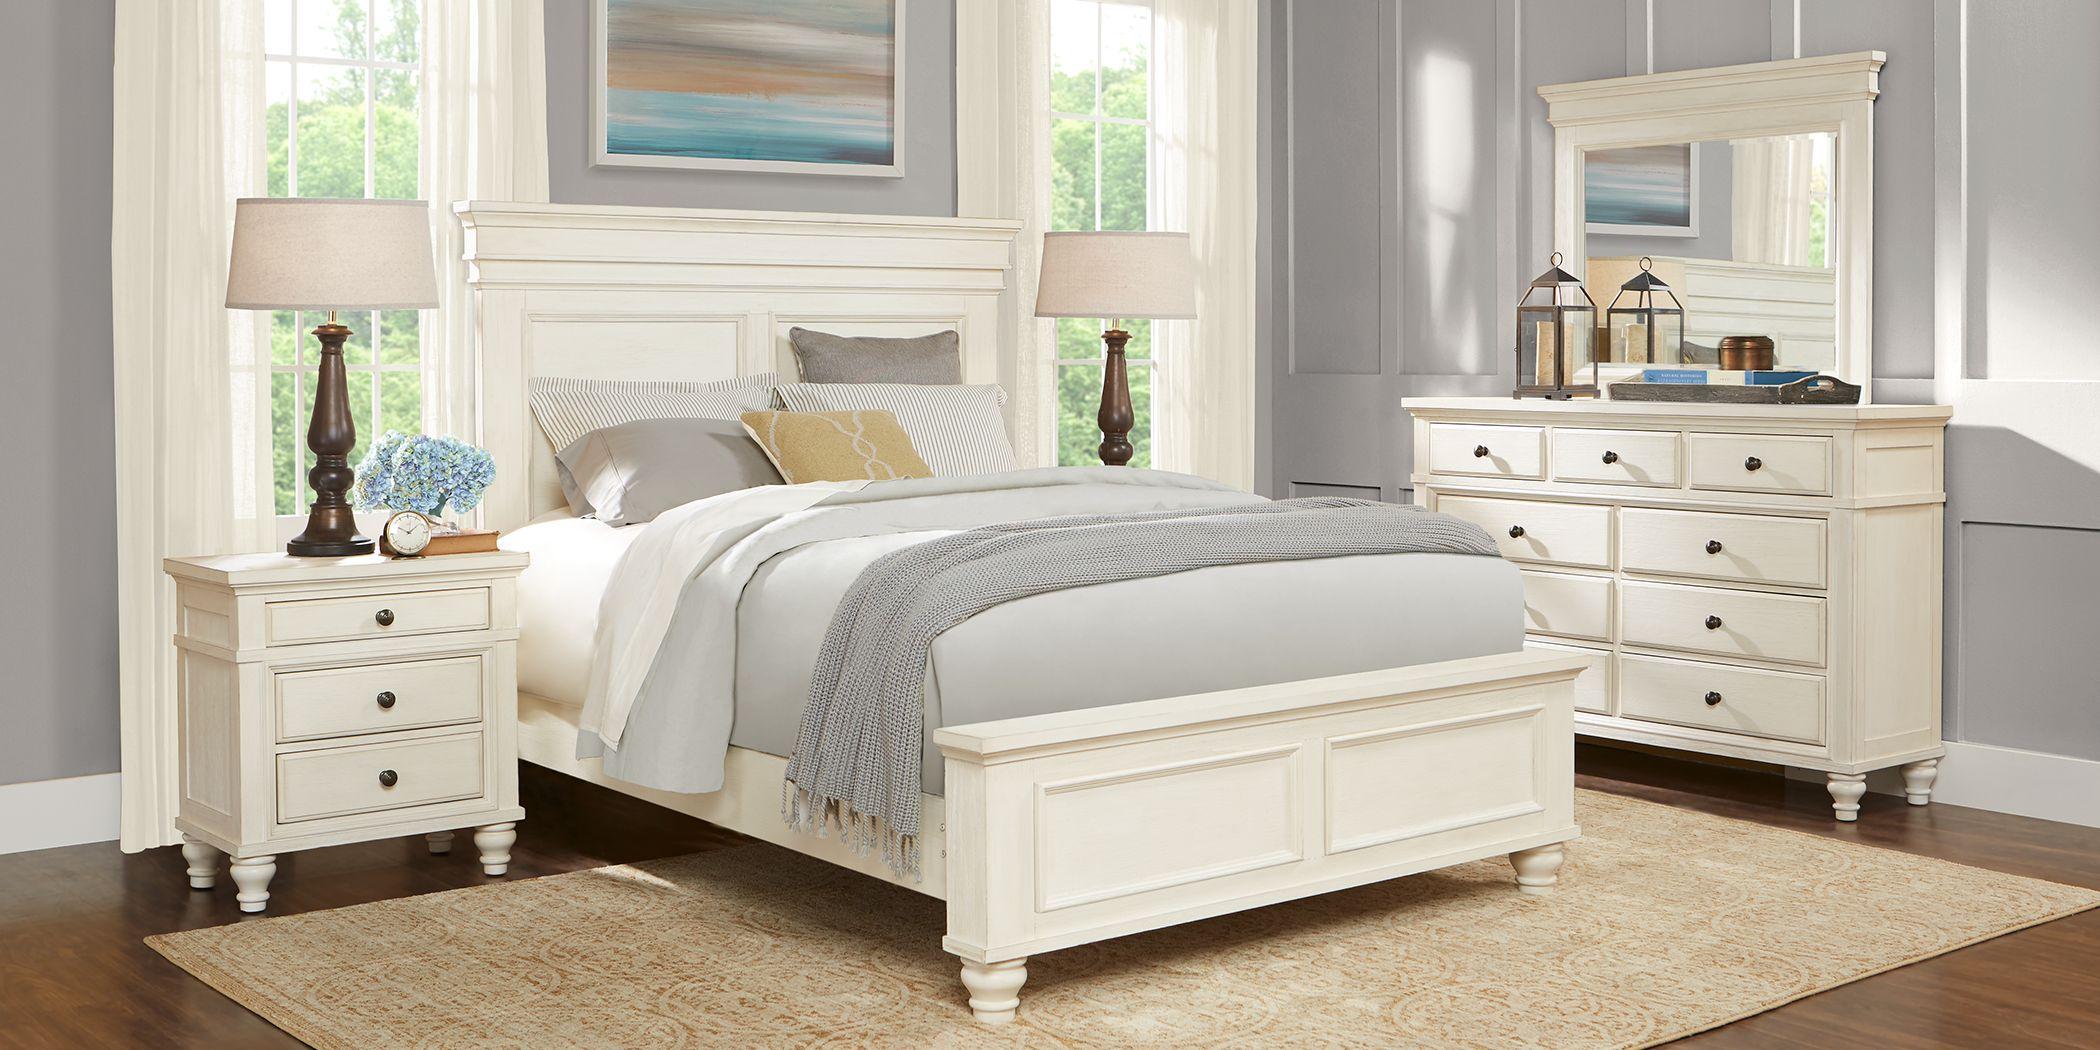 Lake Town Off-White 5 Pc King Panel Bedroom